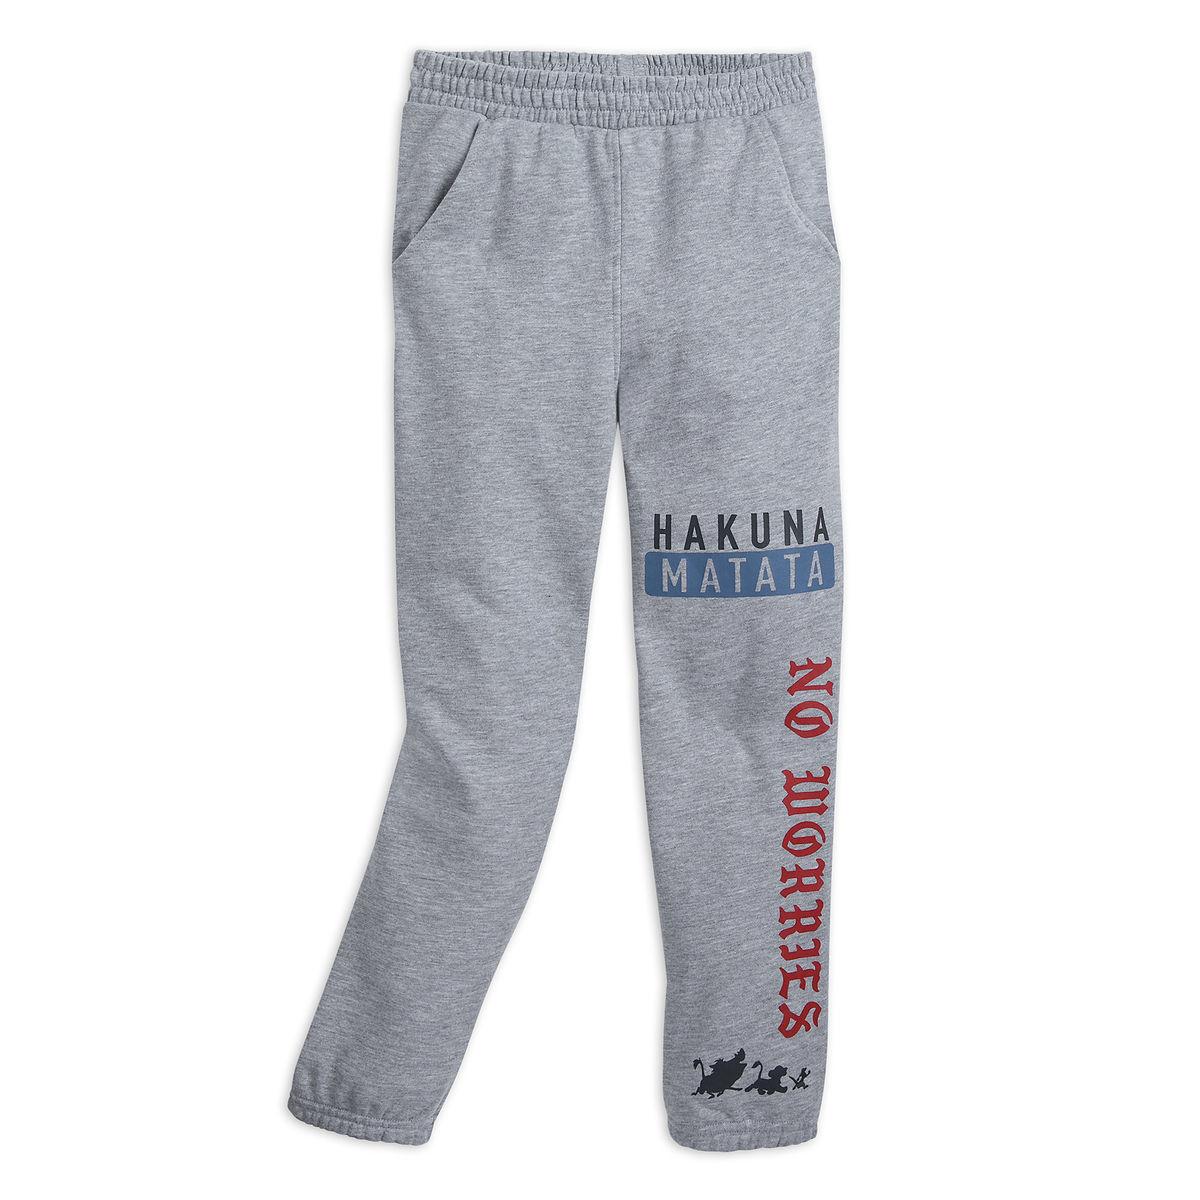 b7ed63159e4fa6 Add to My Lists. Disney Sweatpants for Kids - The Lion King - Hakuna Matata